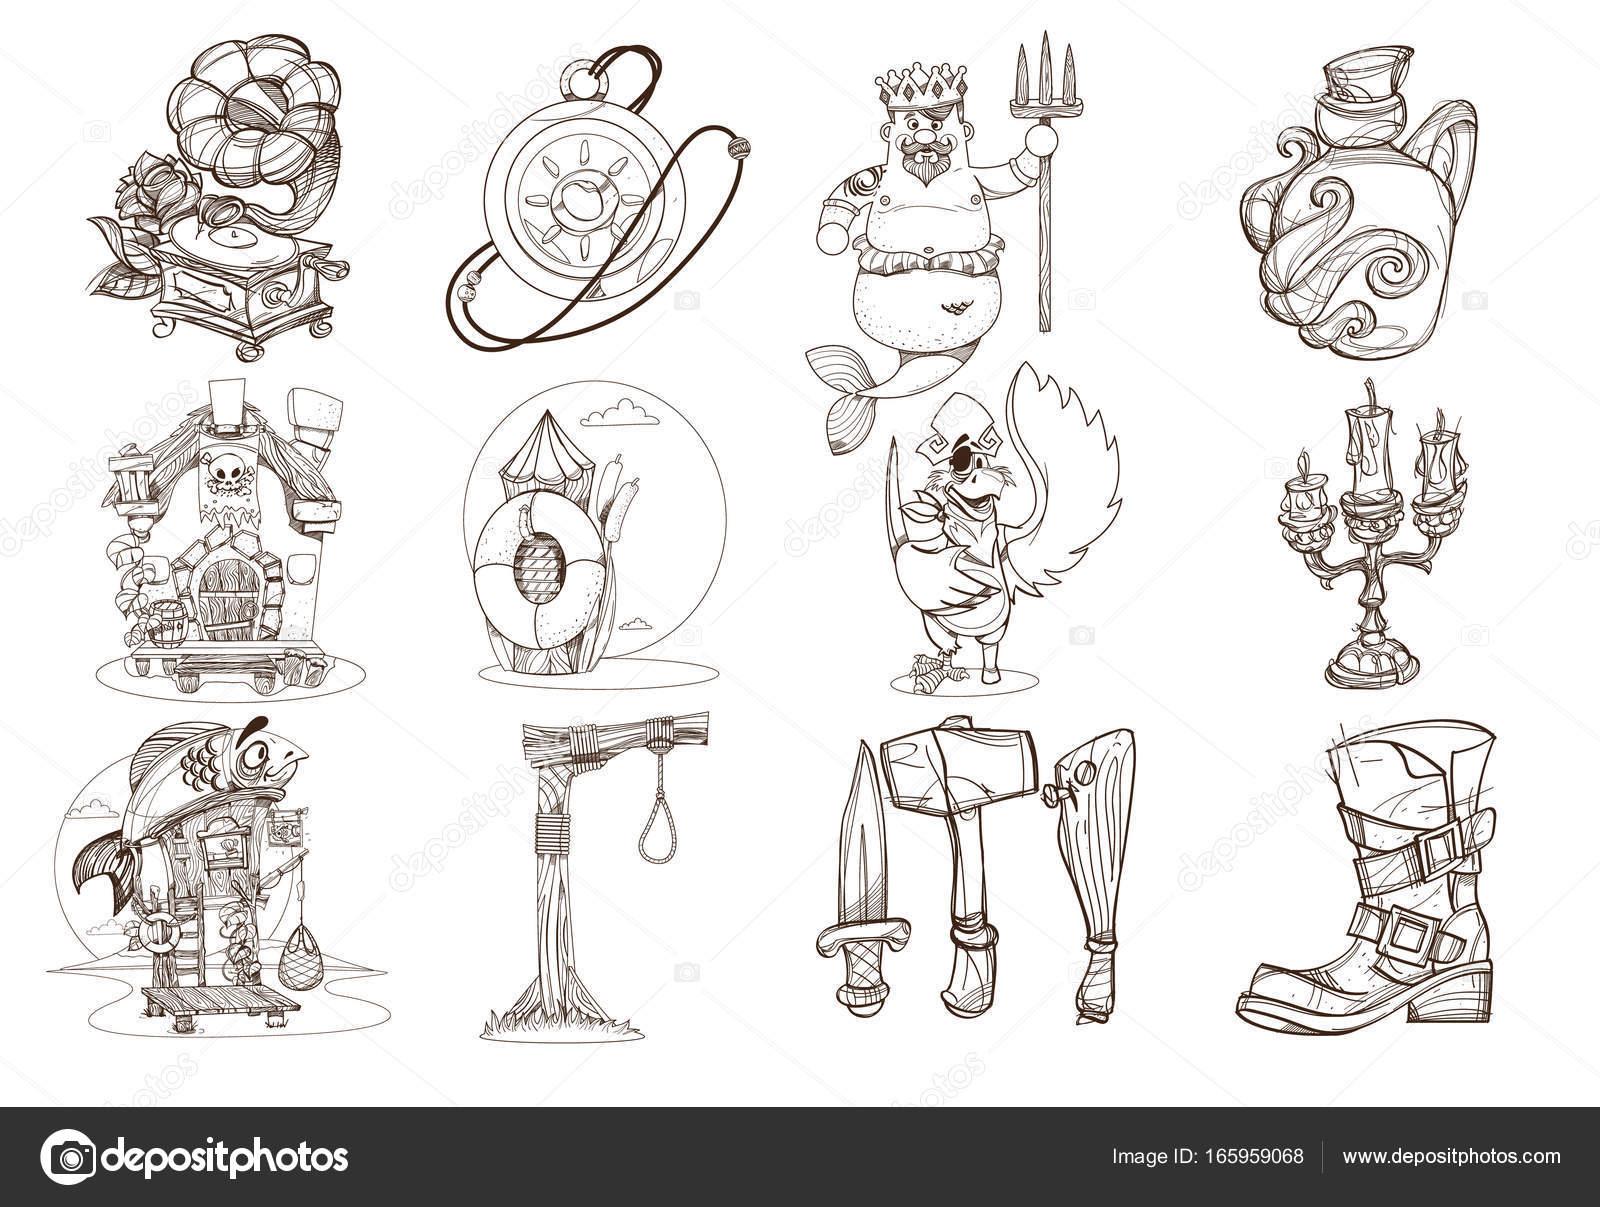 Malvorlagen zum Thema Piraten — Stockvektor © filkusto #165959068